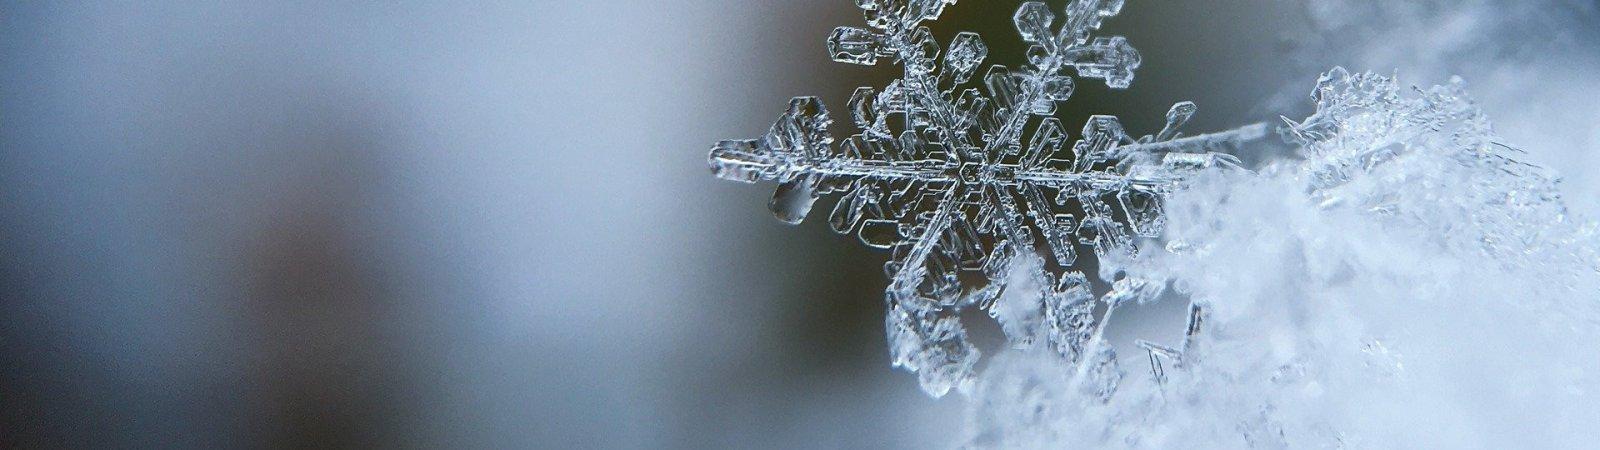 10 films qui donnent froid